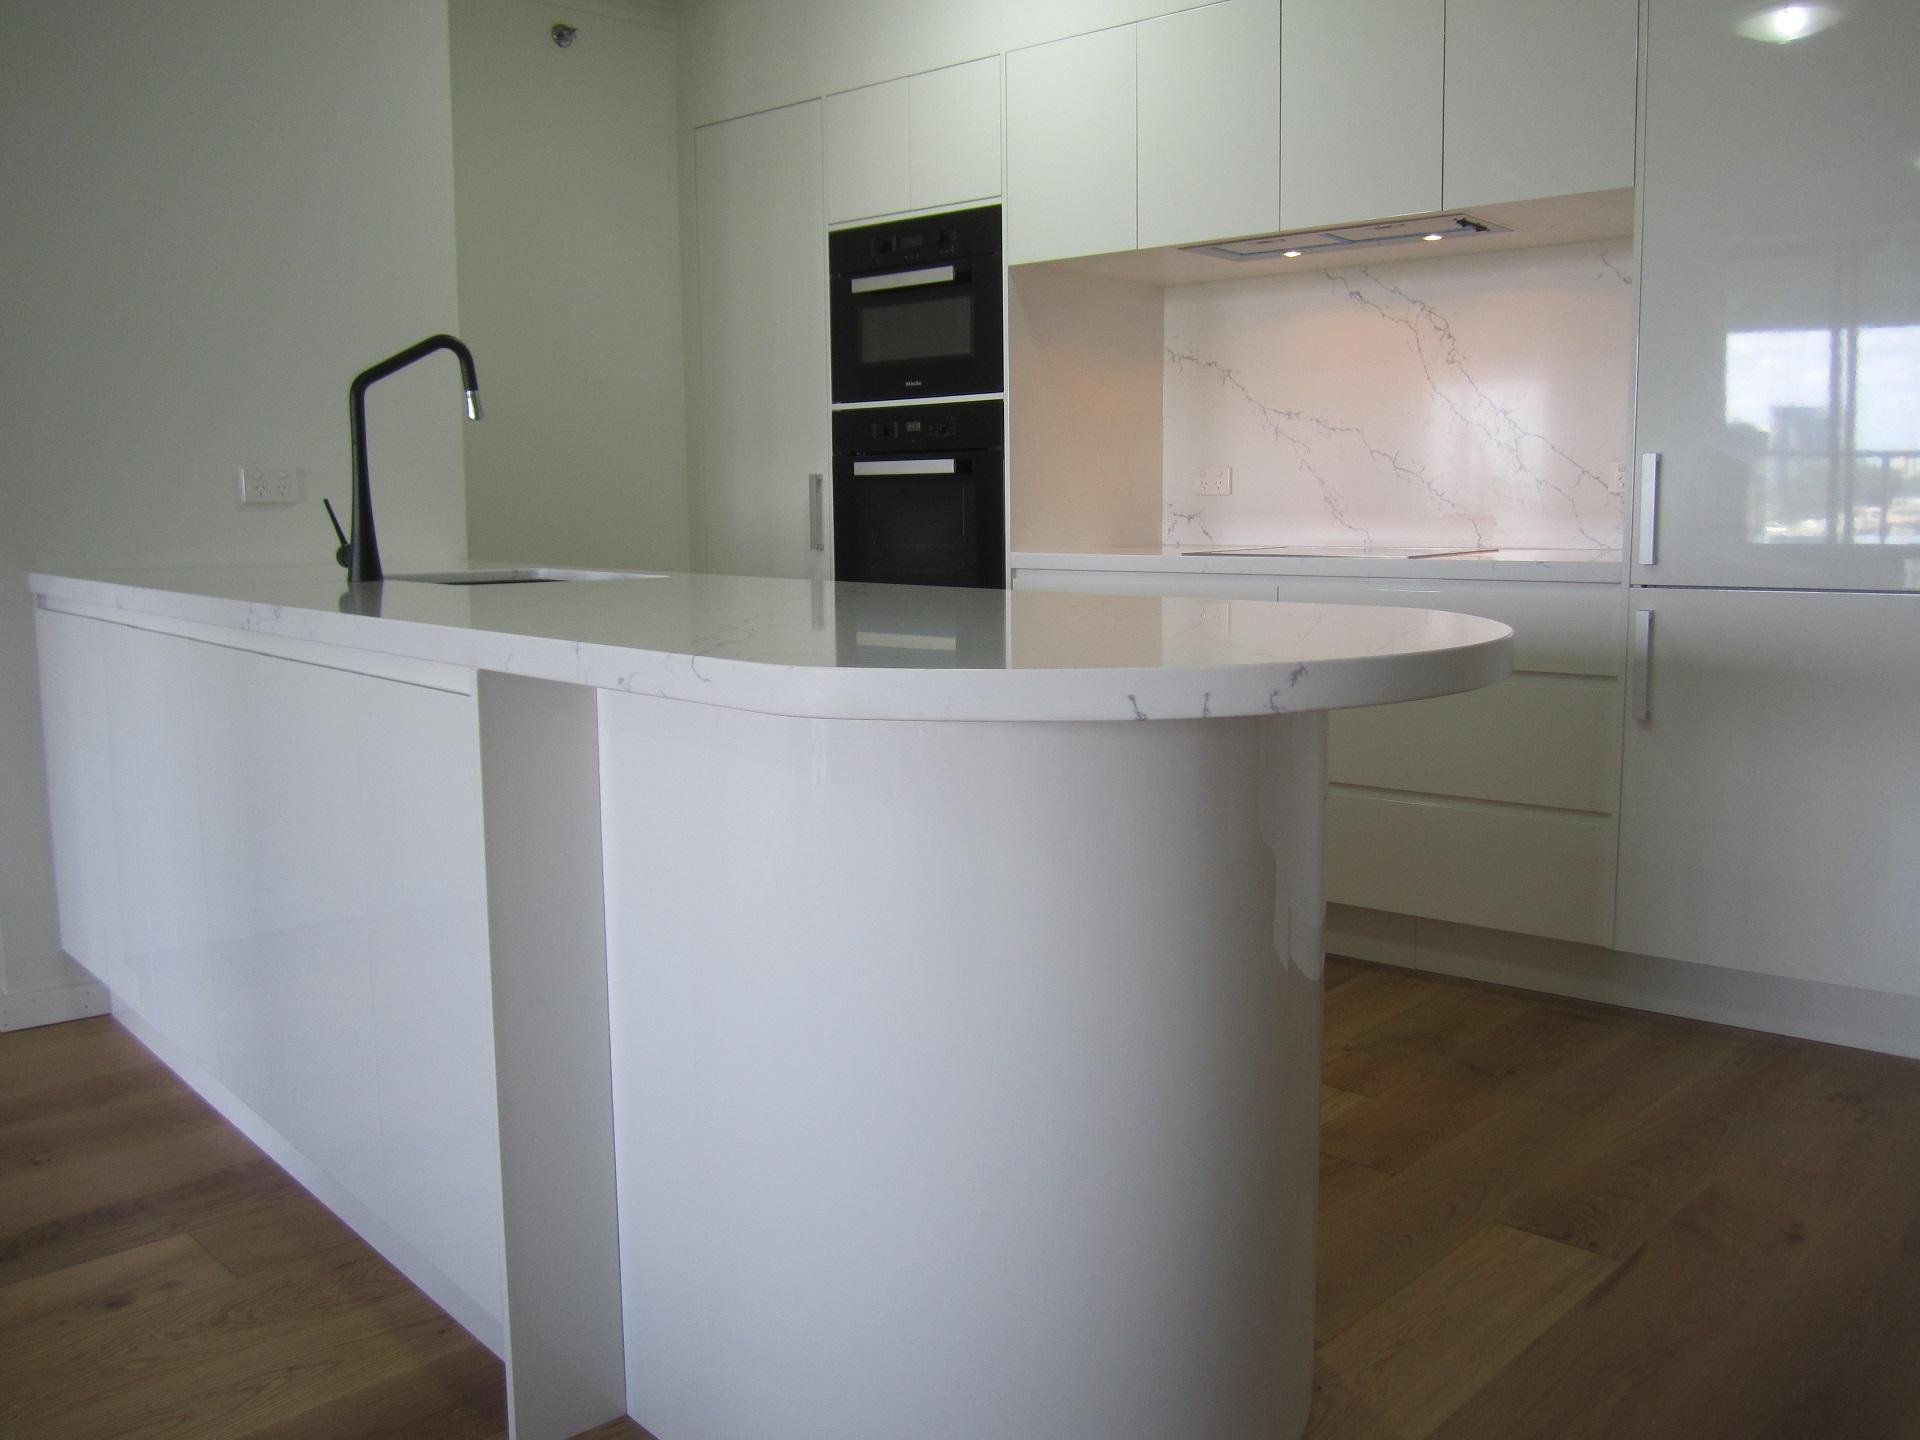 Brisbane Kitchen Design Brisbane City Contemporary Kitchen Renovation White 2 Pac